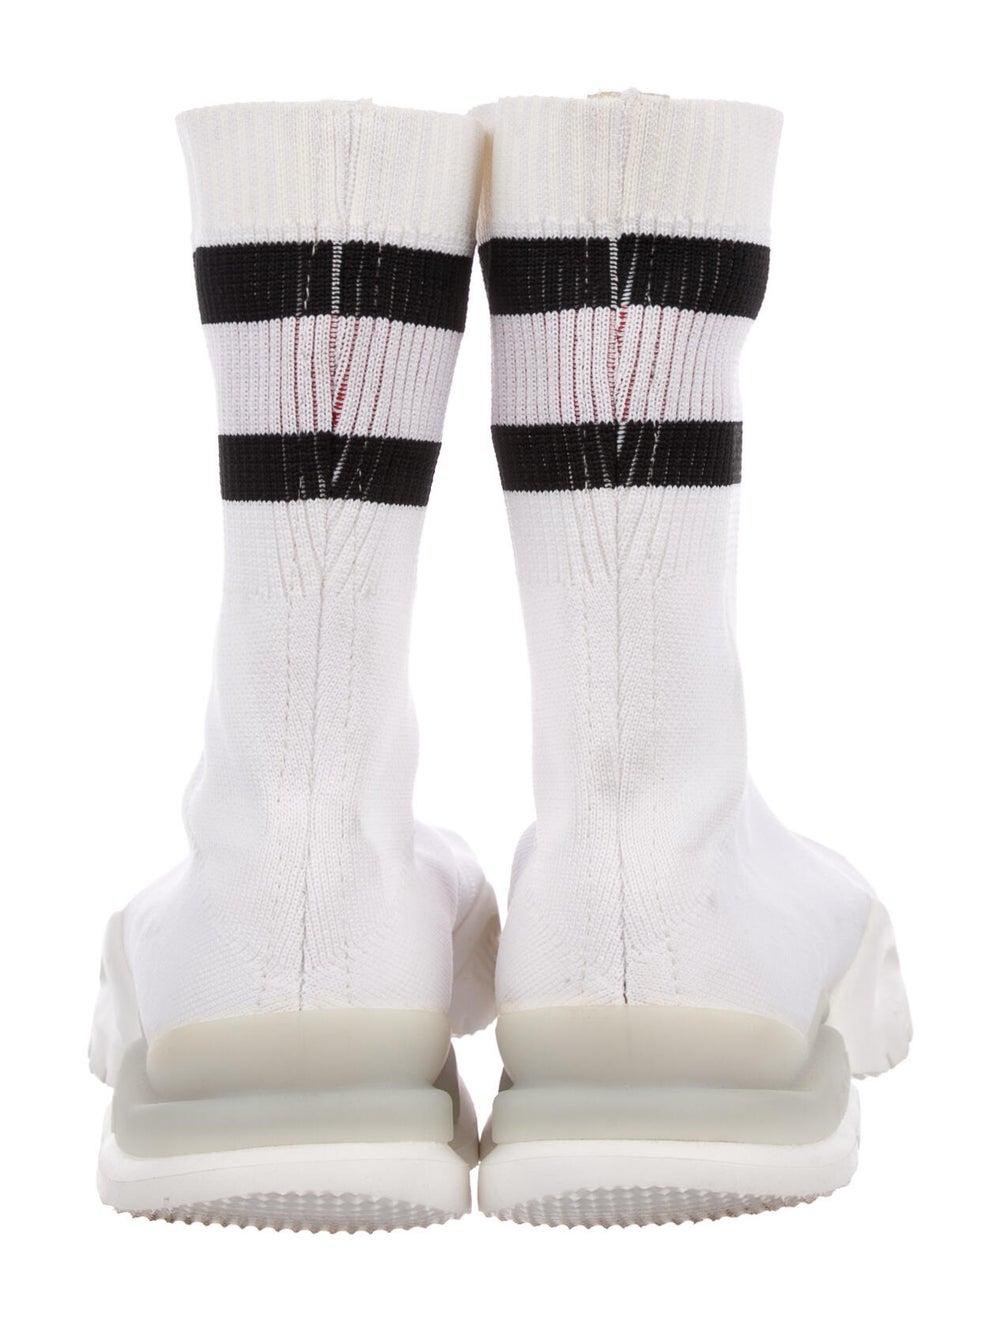 Vetements x Reebok Sock Pump High-Top Sock Sneake… - image 4